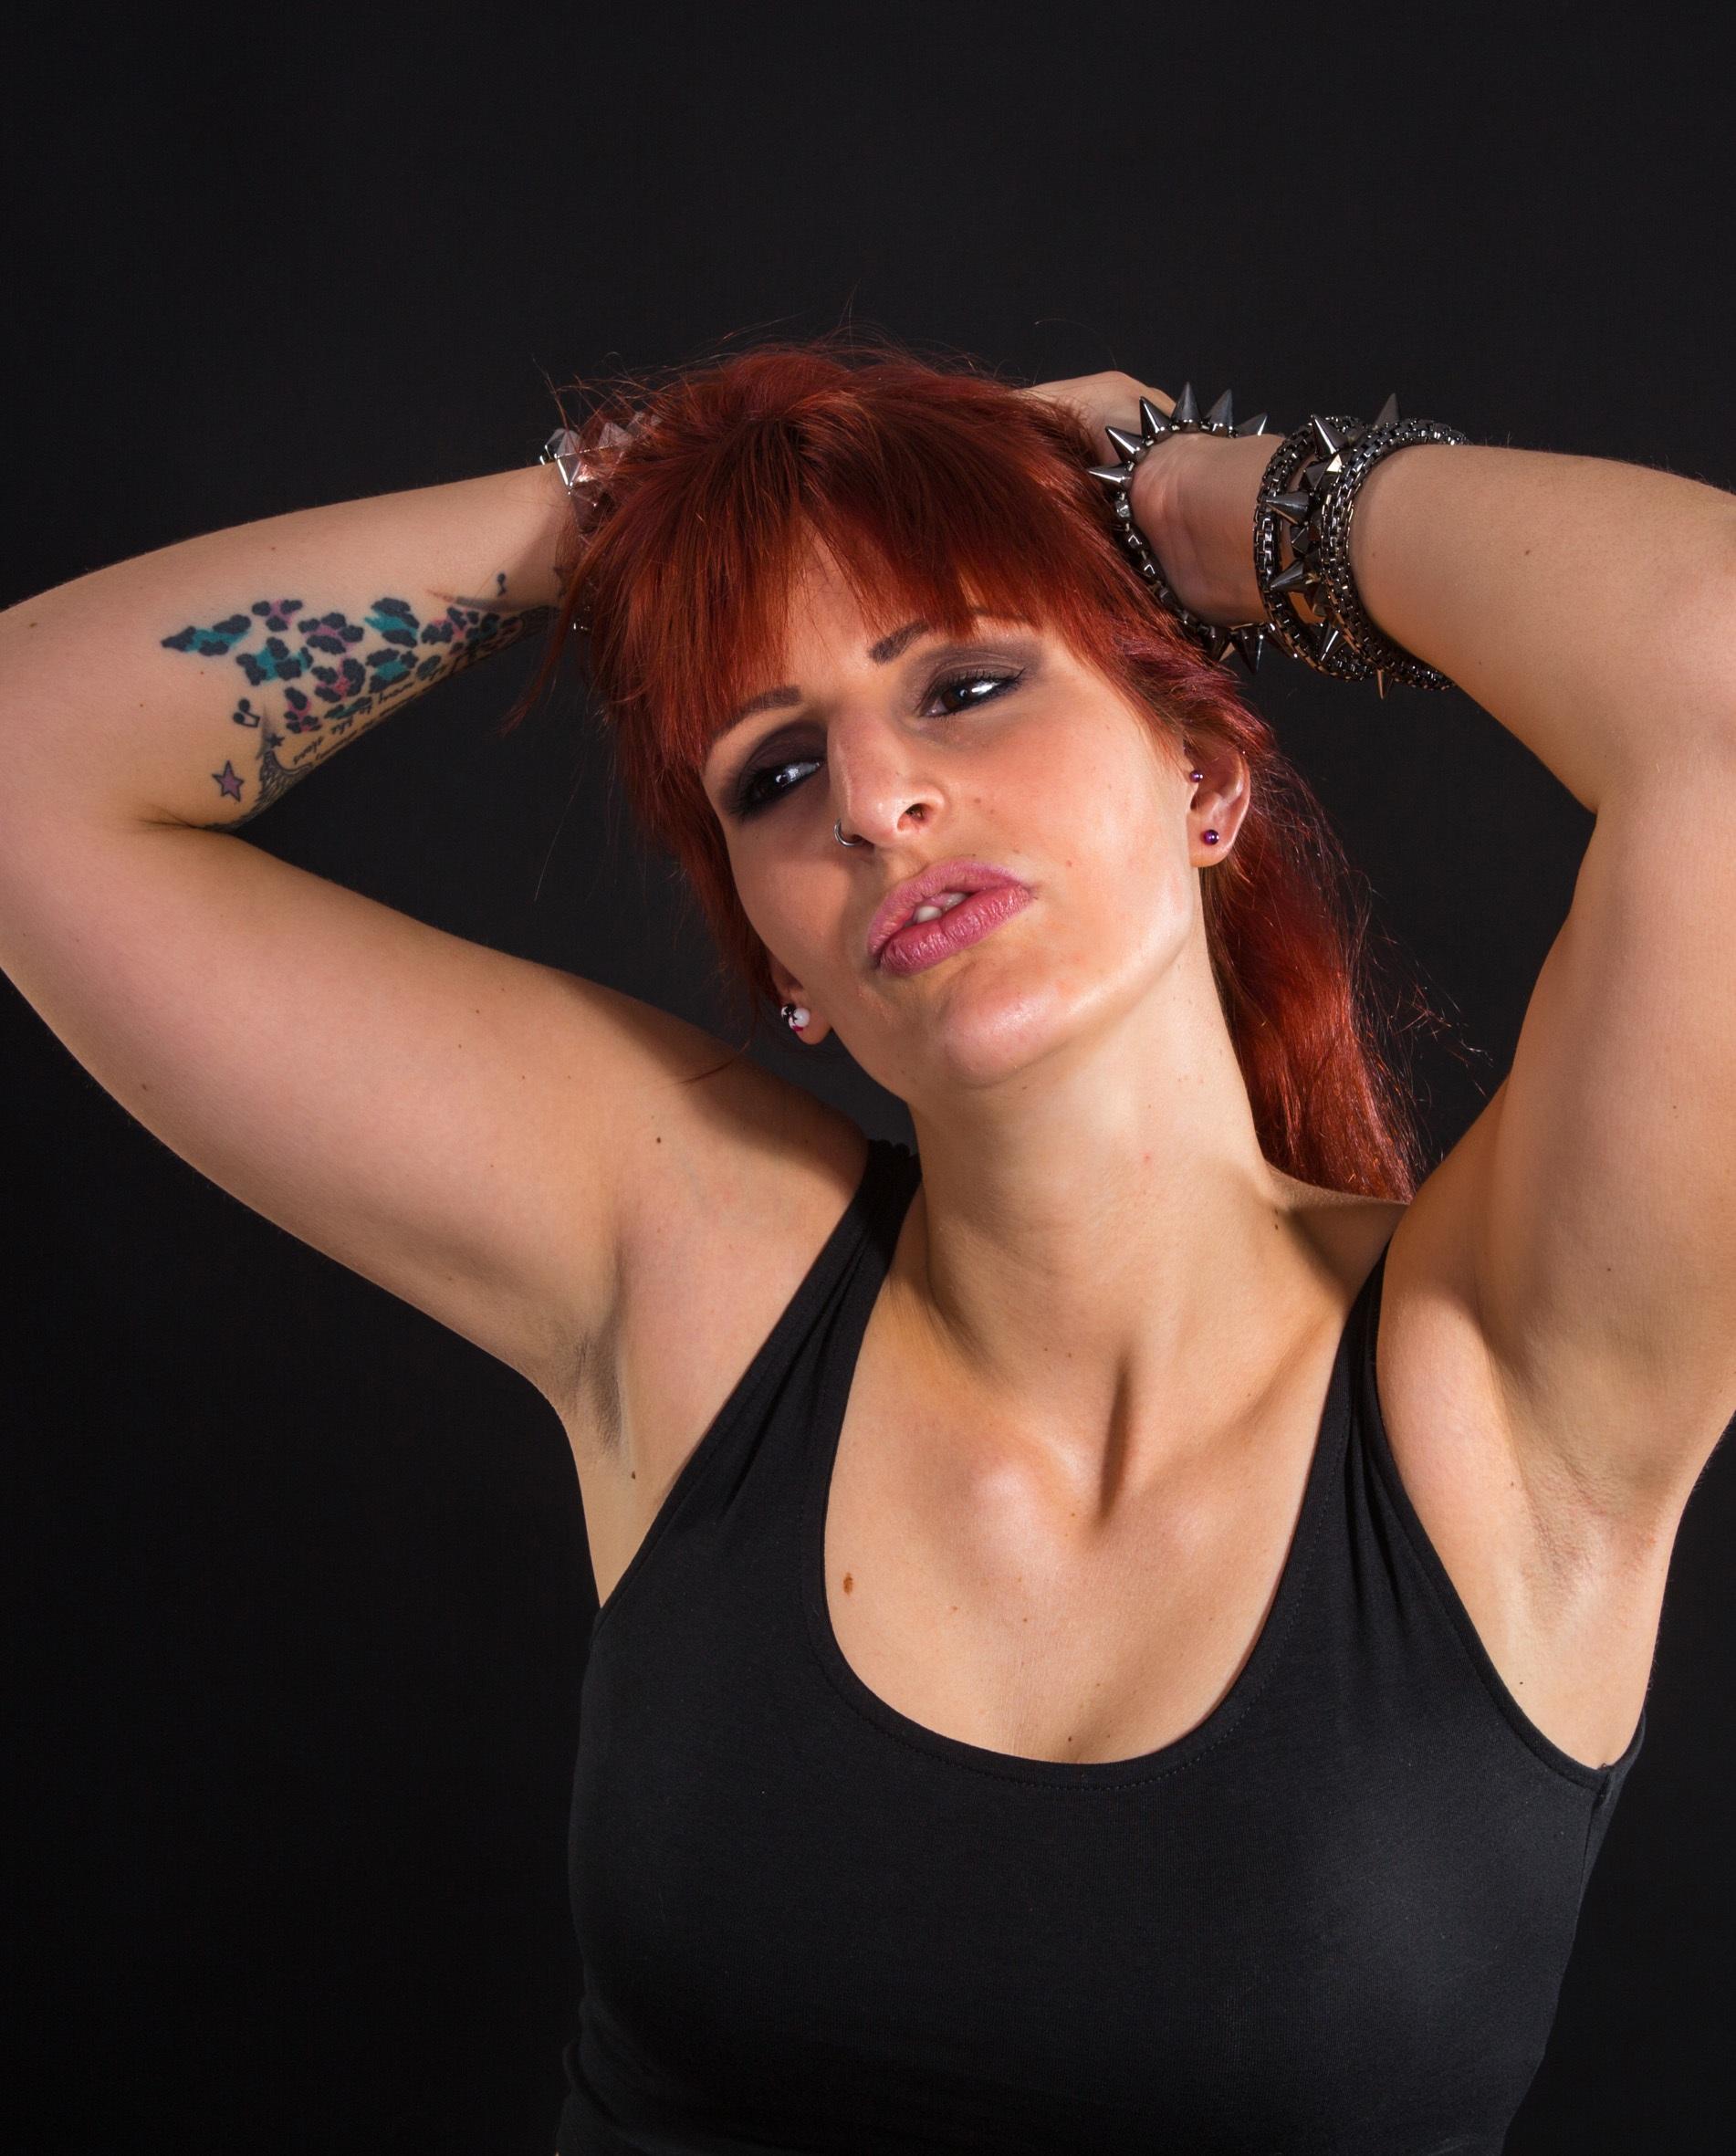 sucking-model-young-erotic-art-multiple-orgasm-video